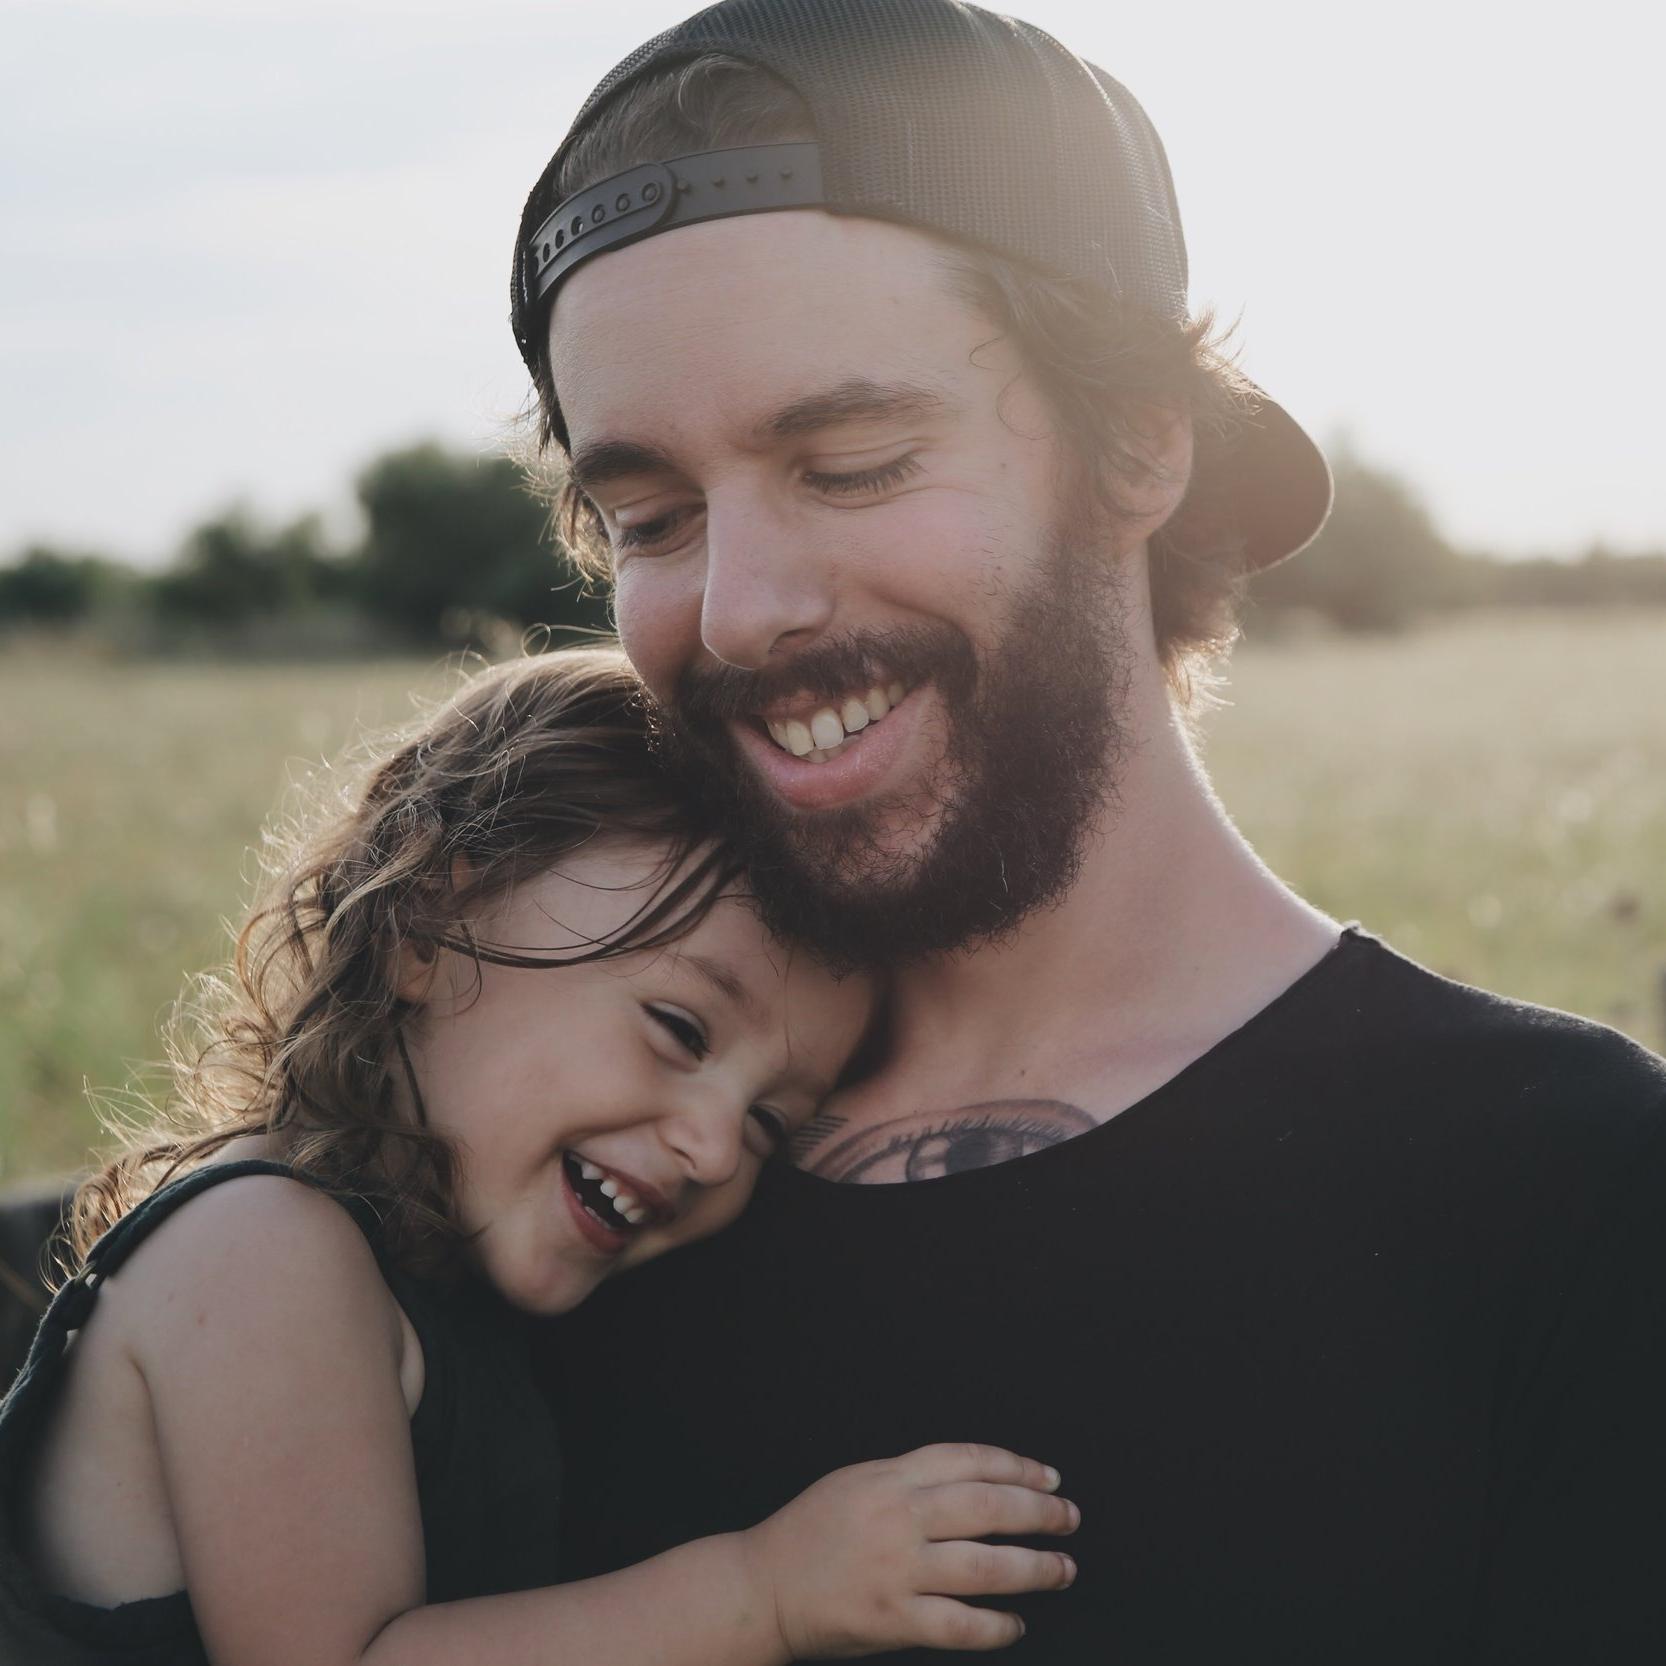 father-daughter-caroline-hernandez-177784.jpg